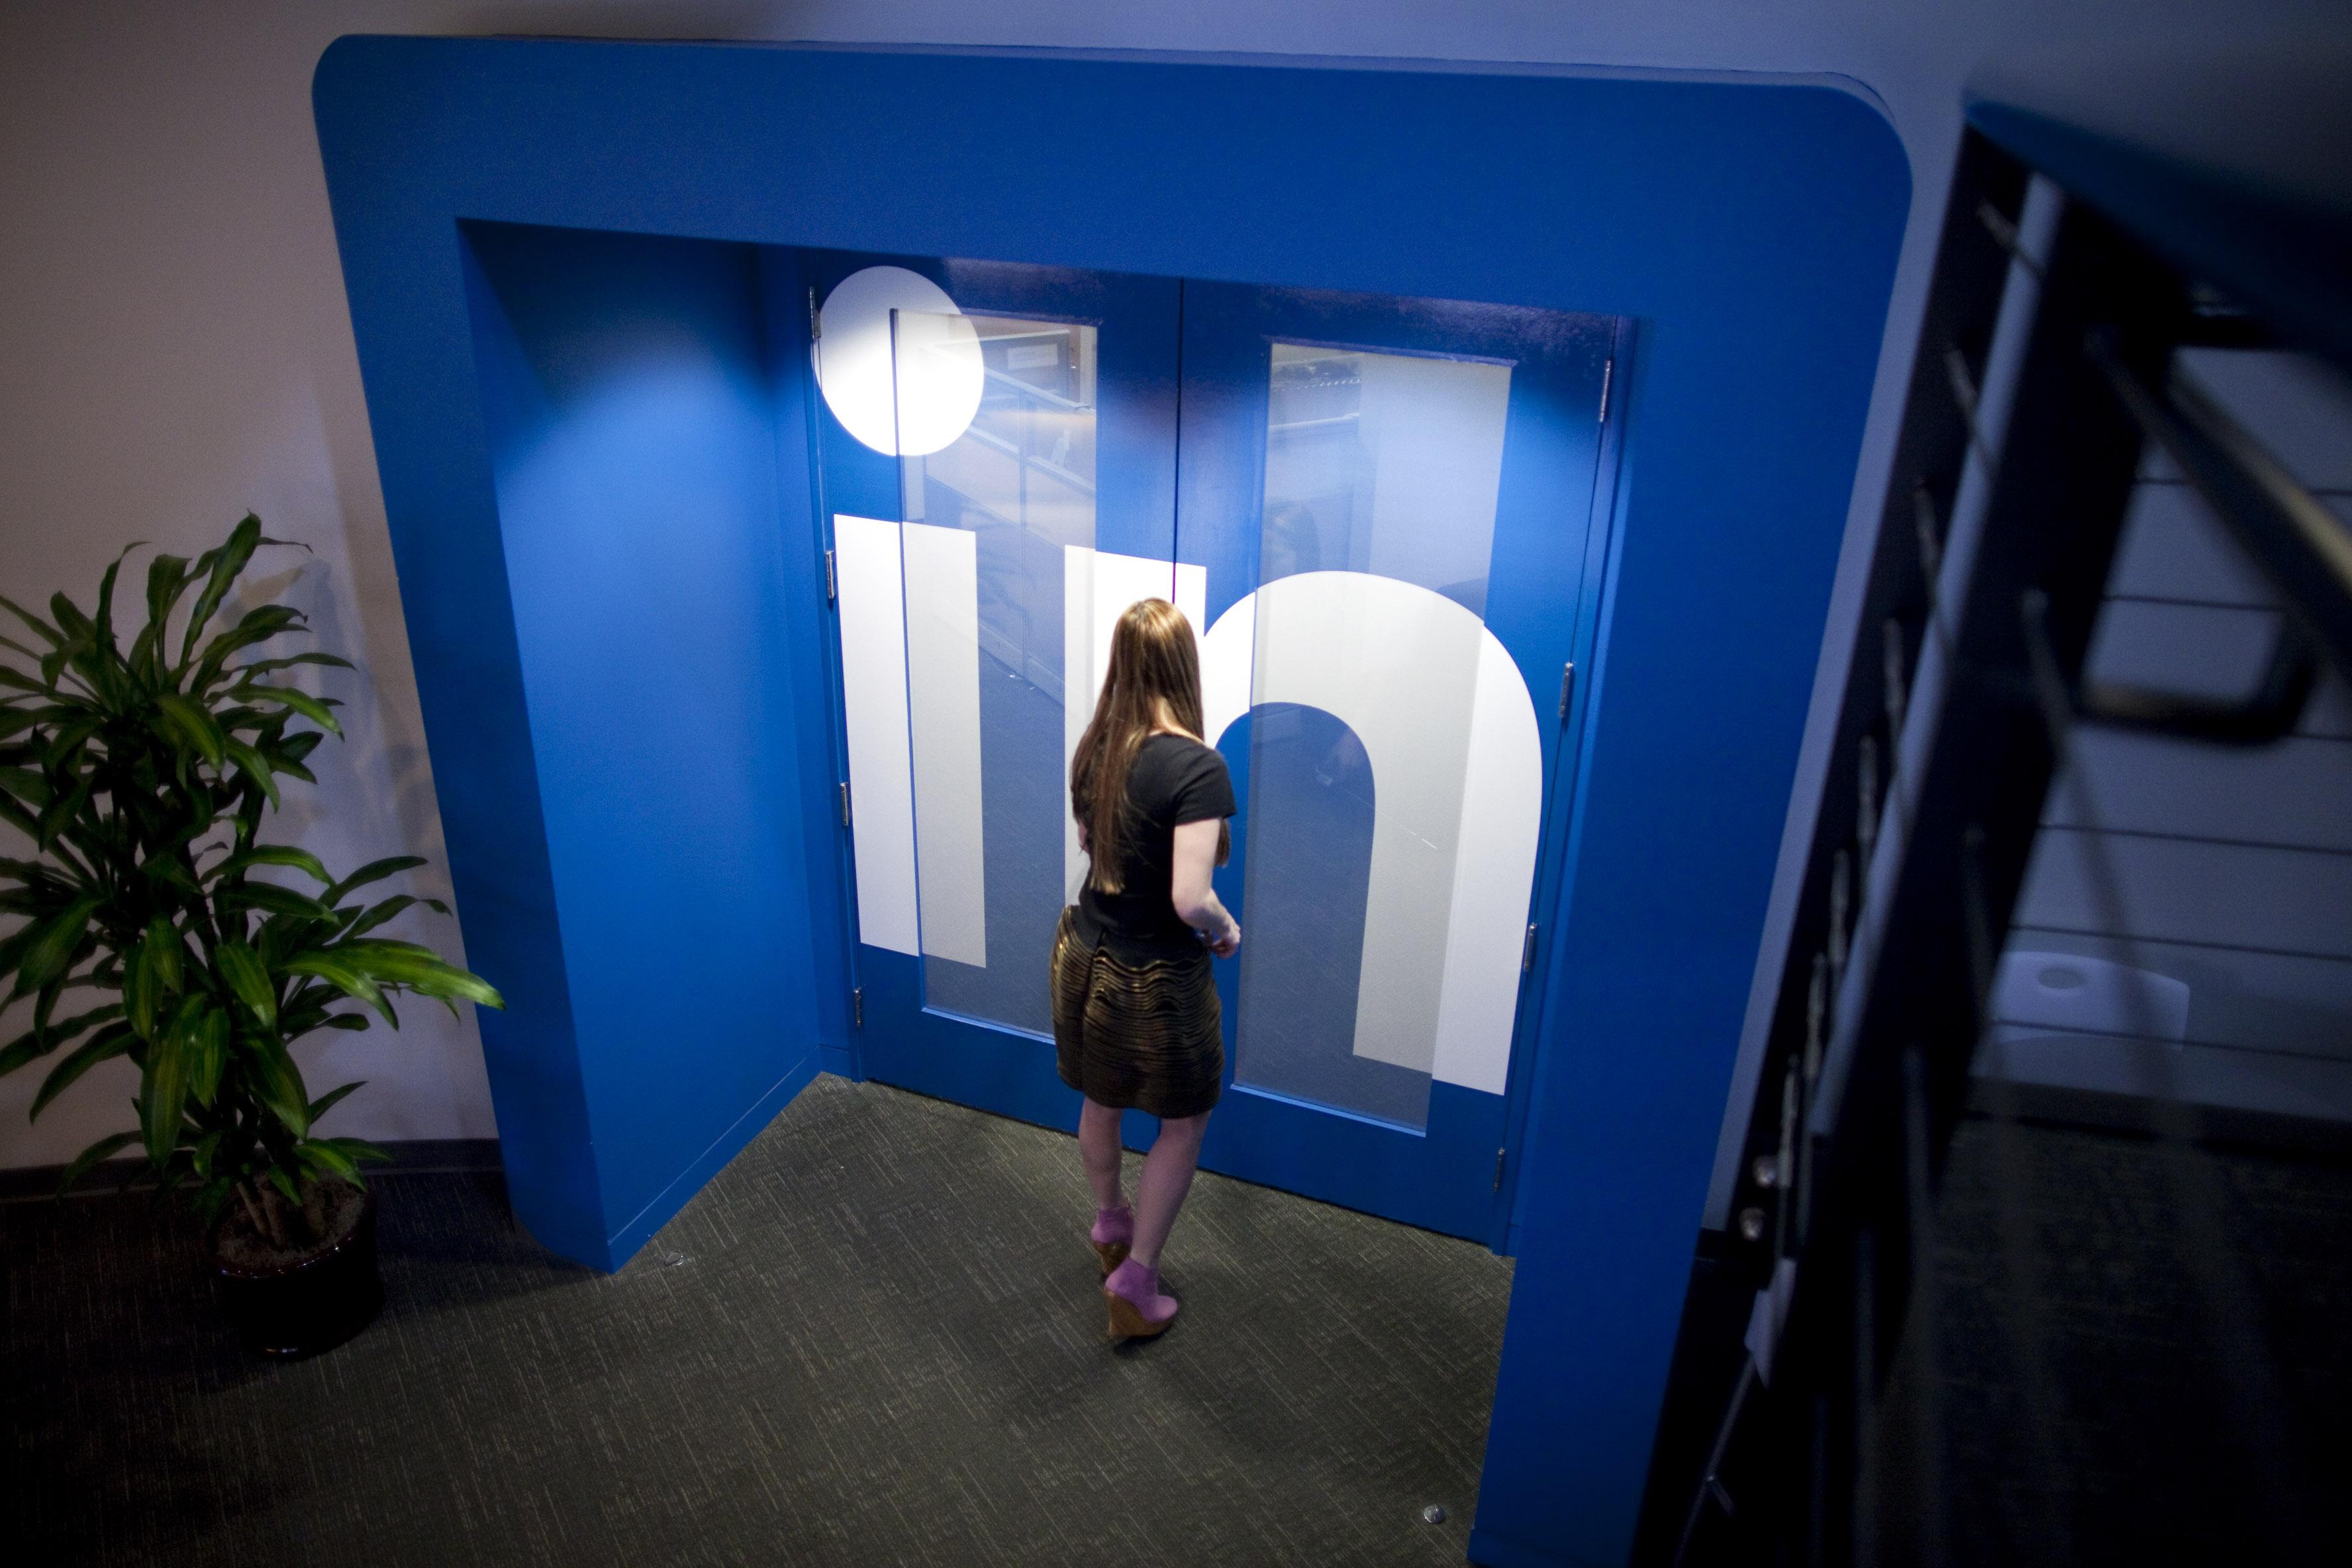 LinkedIn Files For Initial Public Offering, Seeks $175 Million